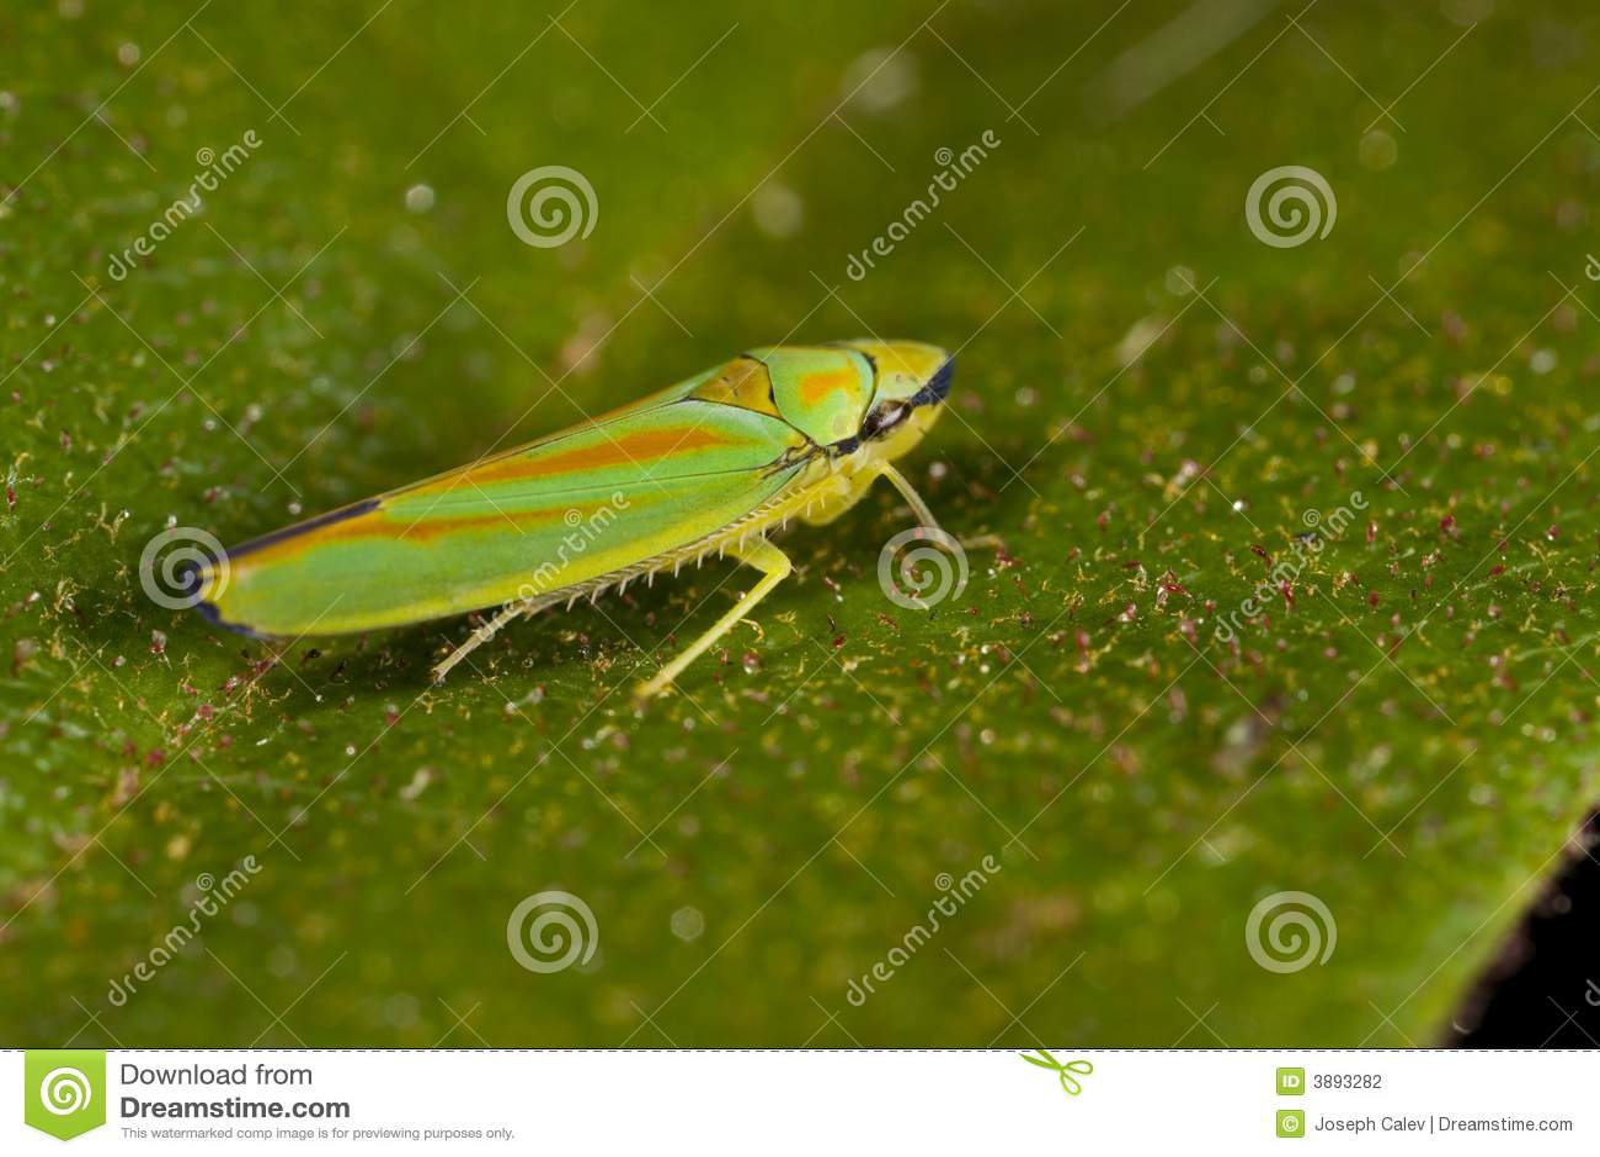 Cicadellide